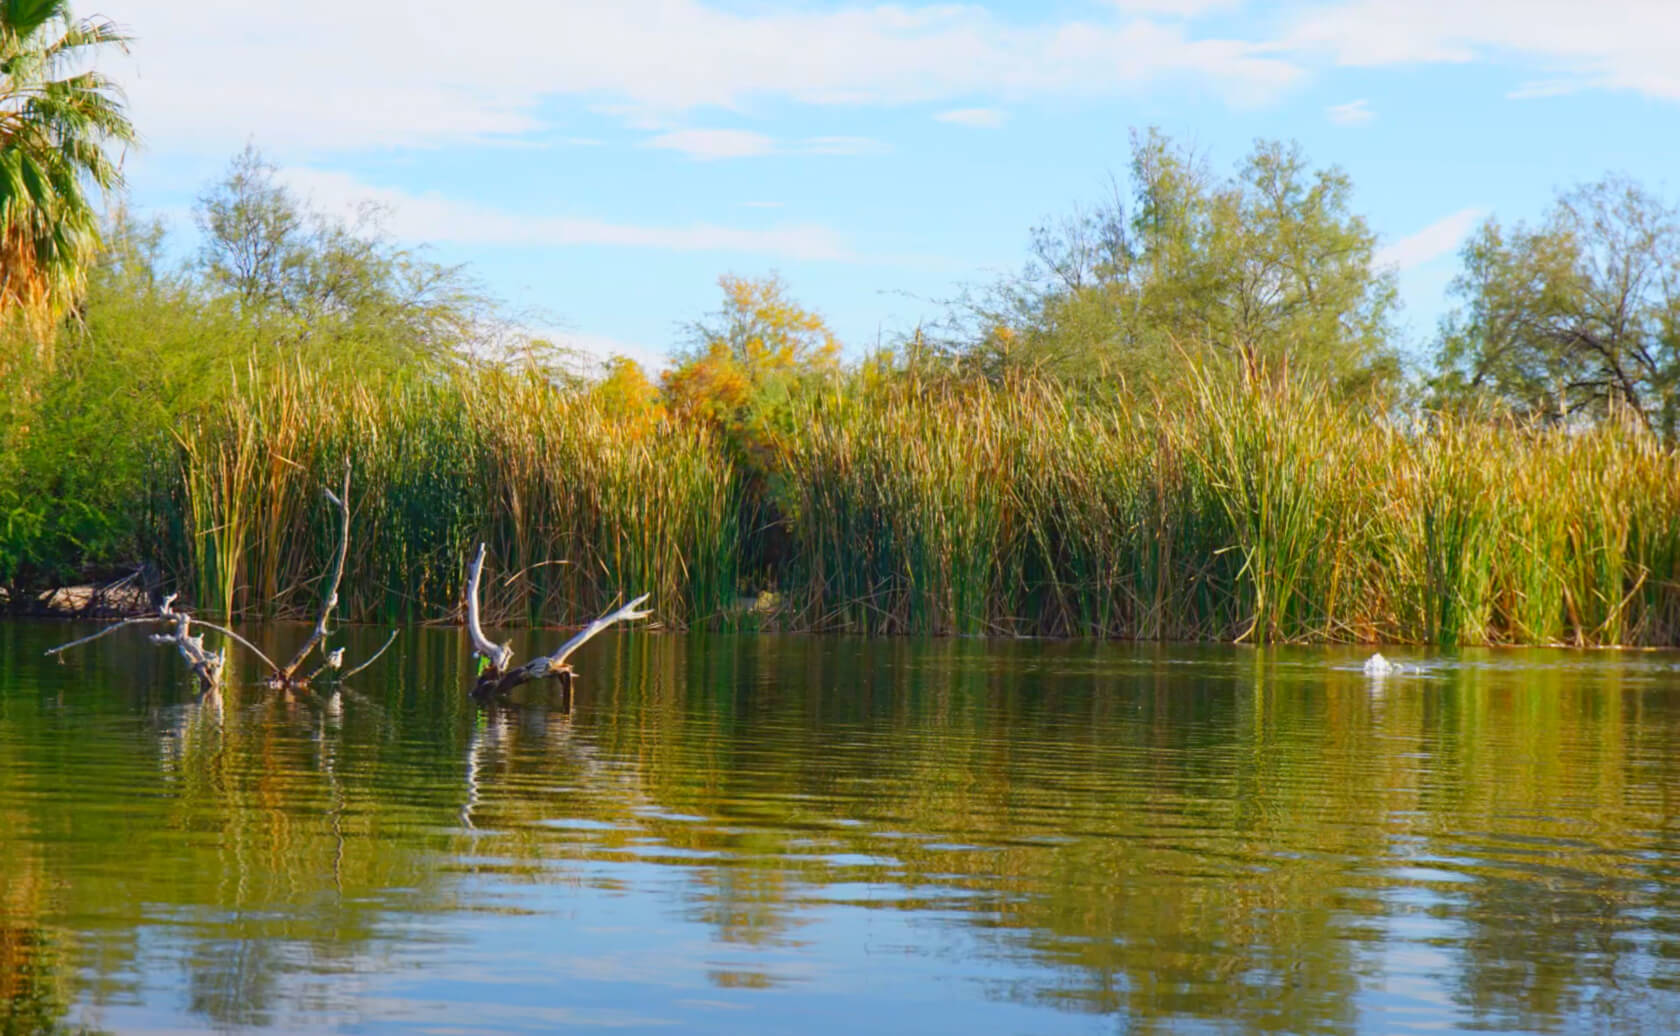 Fortuna-Lake-Fishing-Guide-Report-Yuma-AZ-05